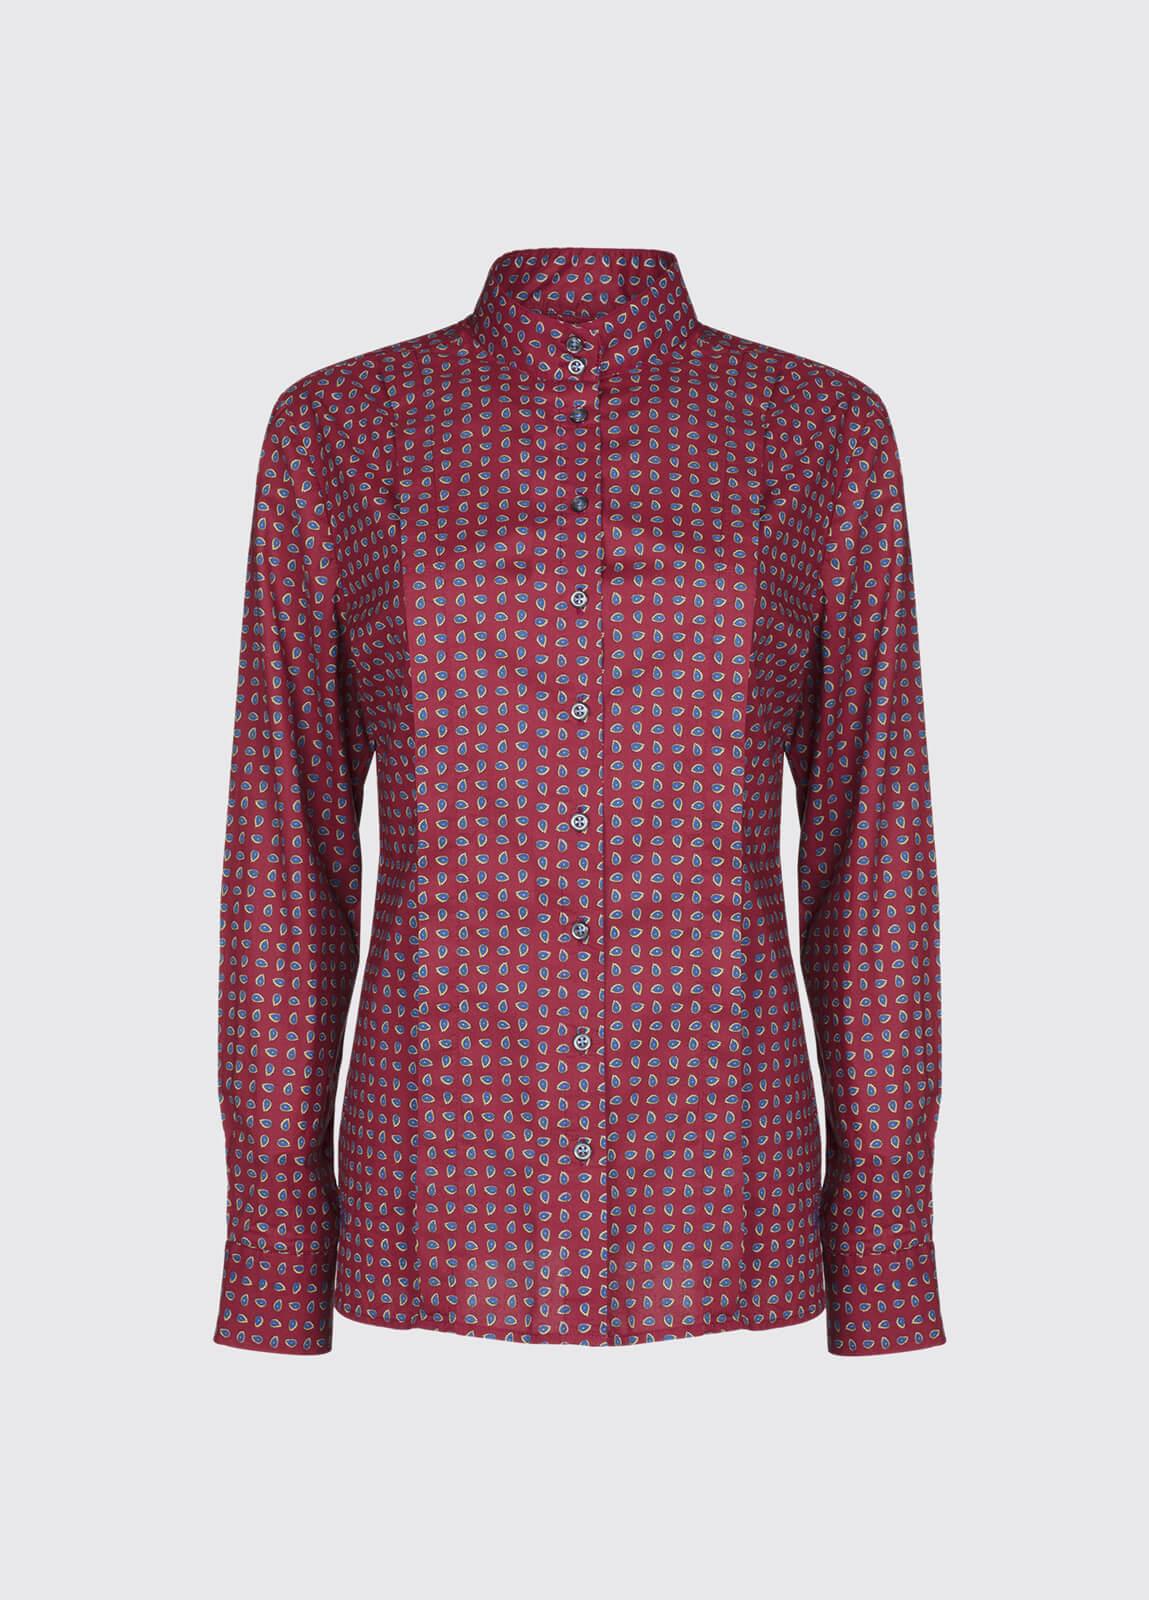 Snapdragon Shirt - Malbec